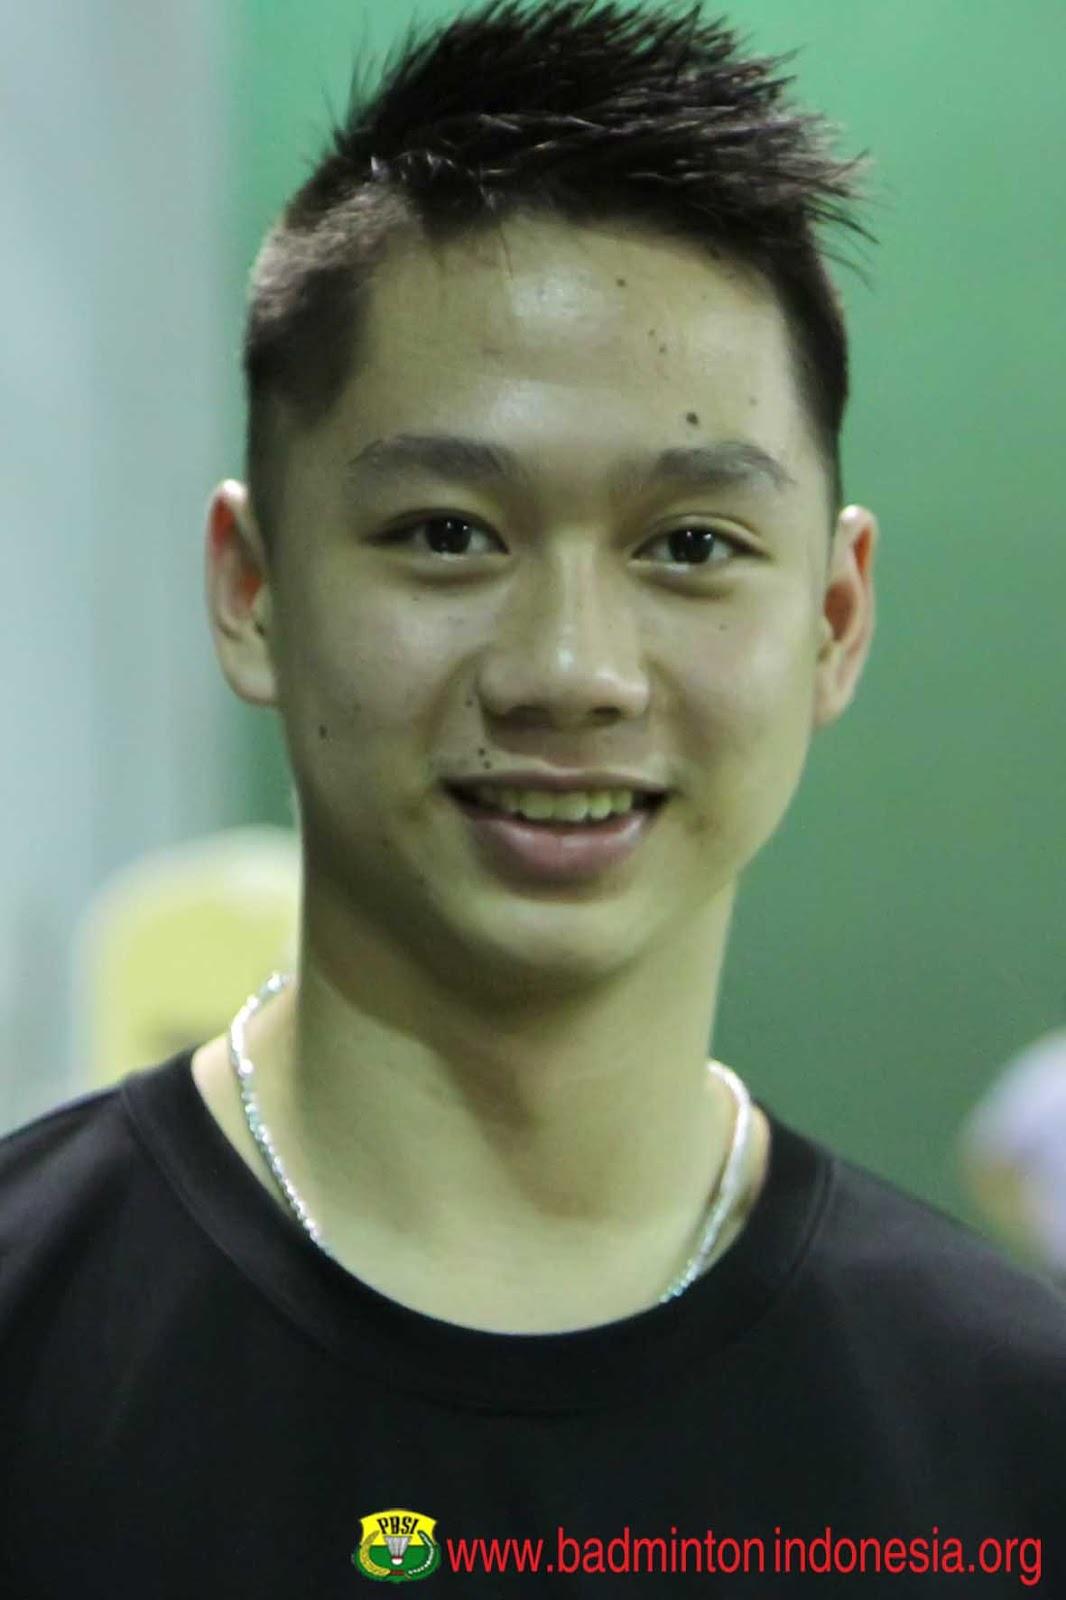 KEVIN SANJAYA SUKAMULJO Badminton Lovers Zone